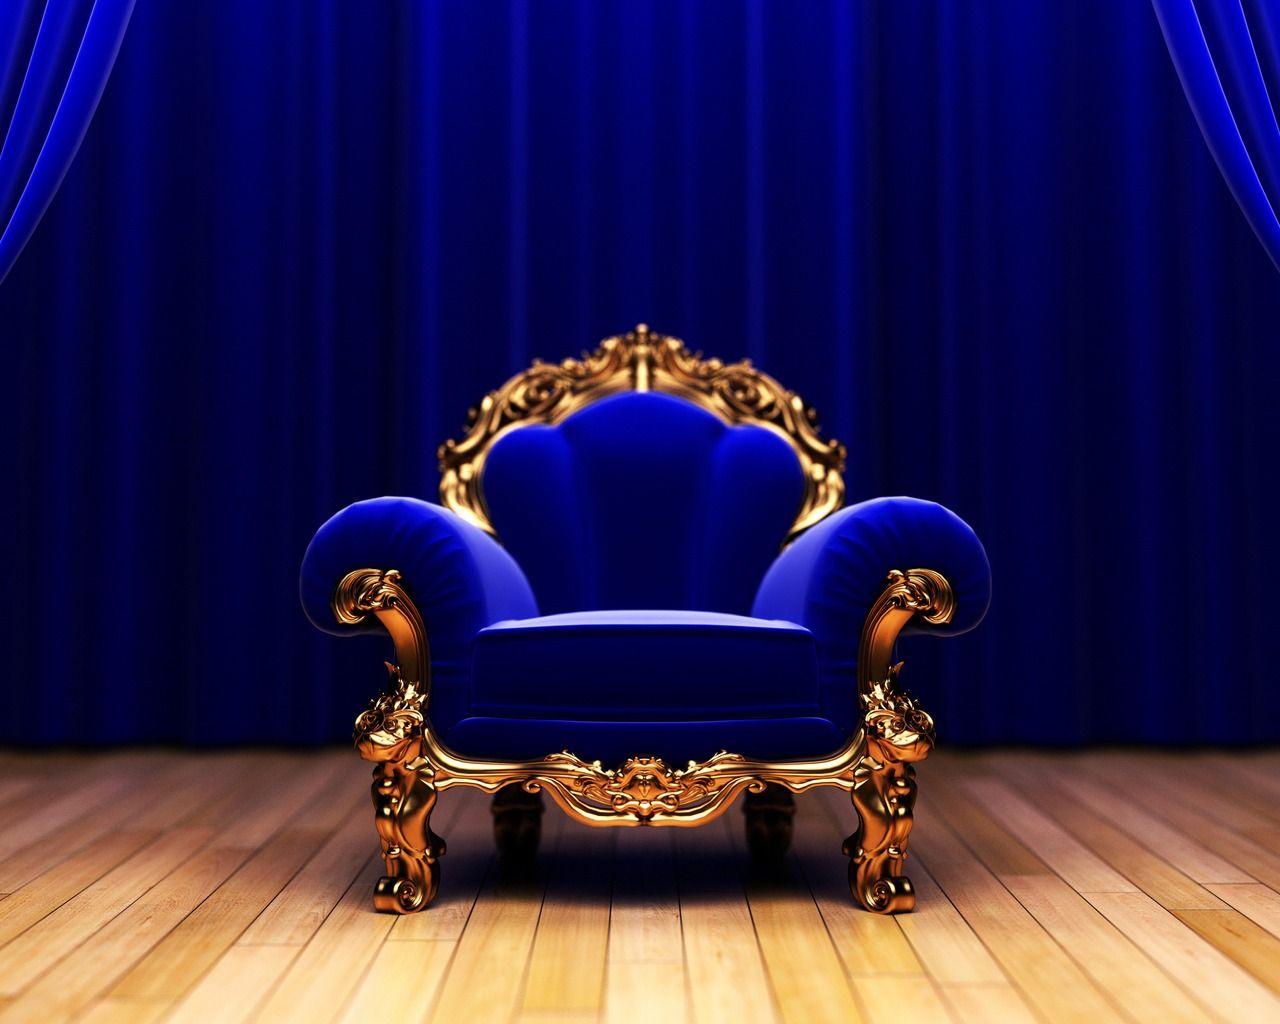 Royal Armchair Wallpaper Hd Wallpapers Source Royal Blue Wallpaper Royal Blue Chair Blue Chair